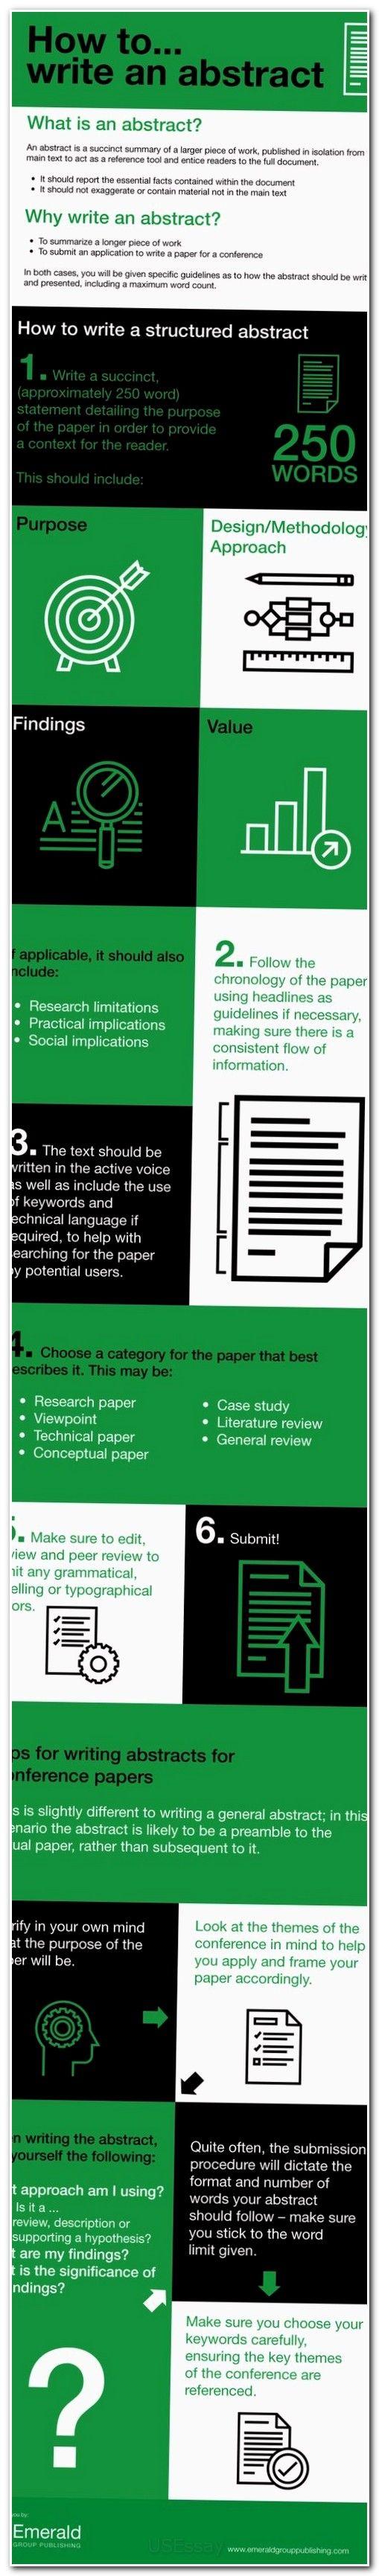 Buy a dissertation online checker